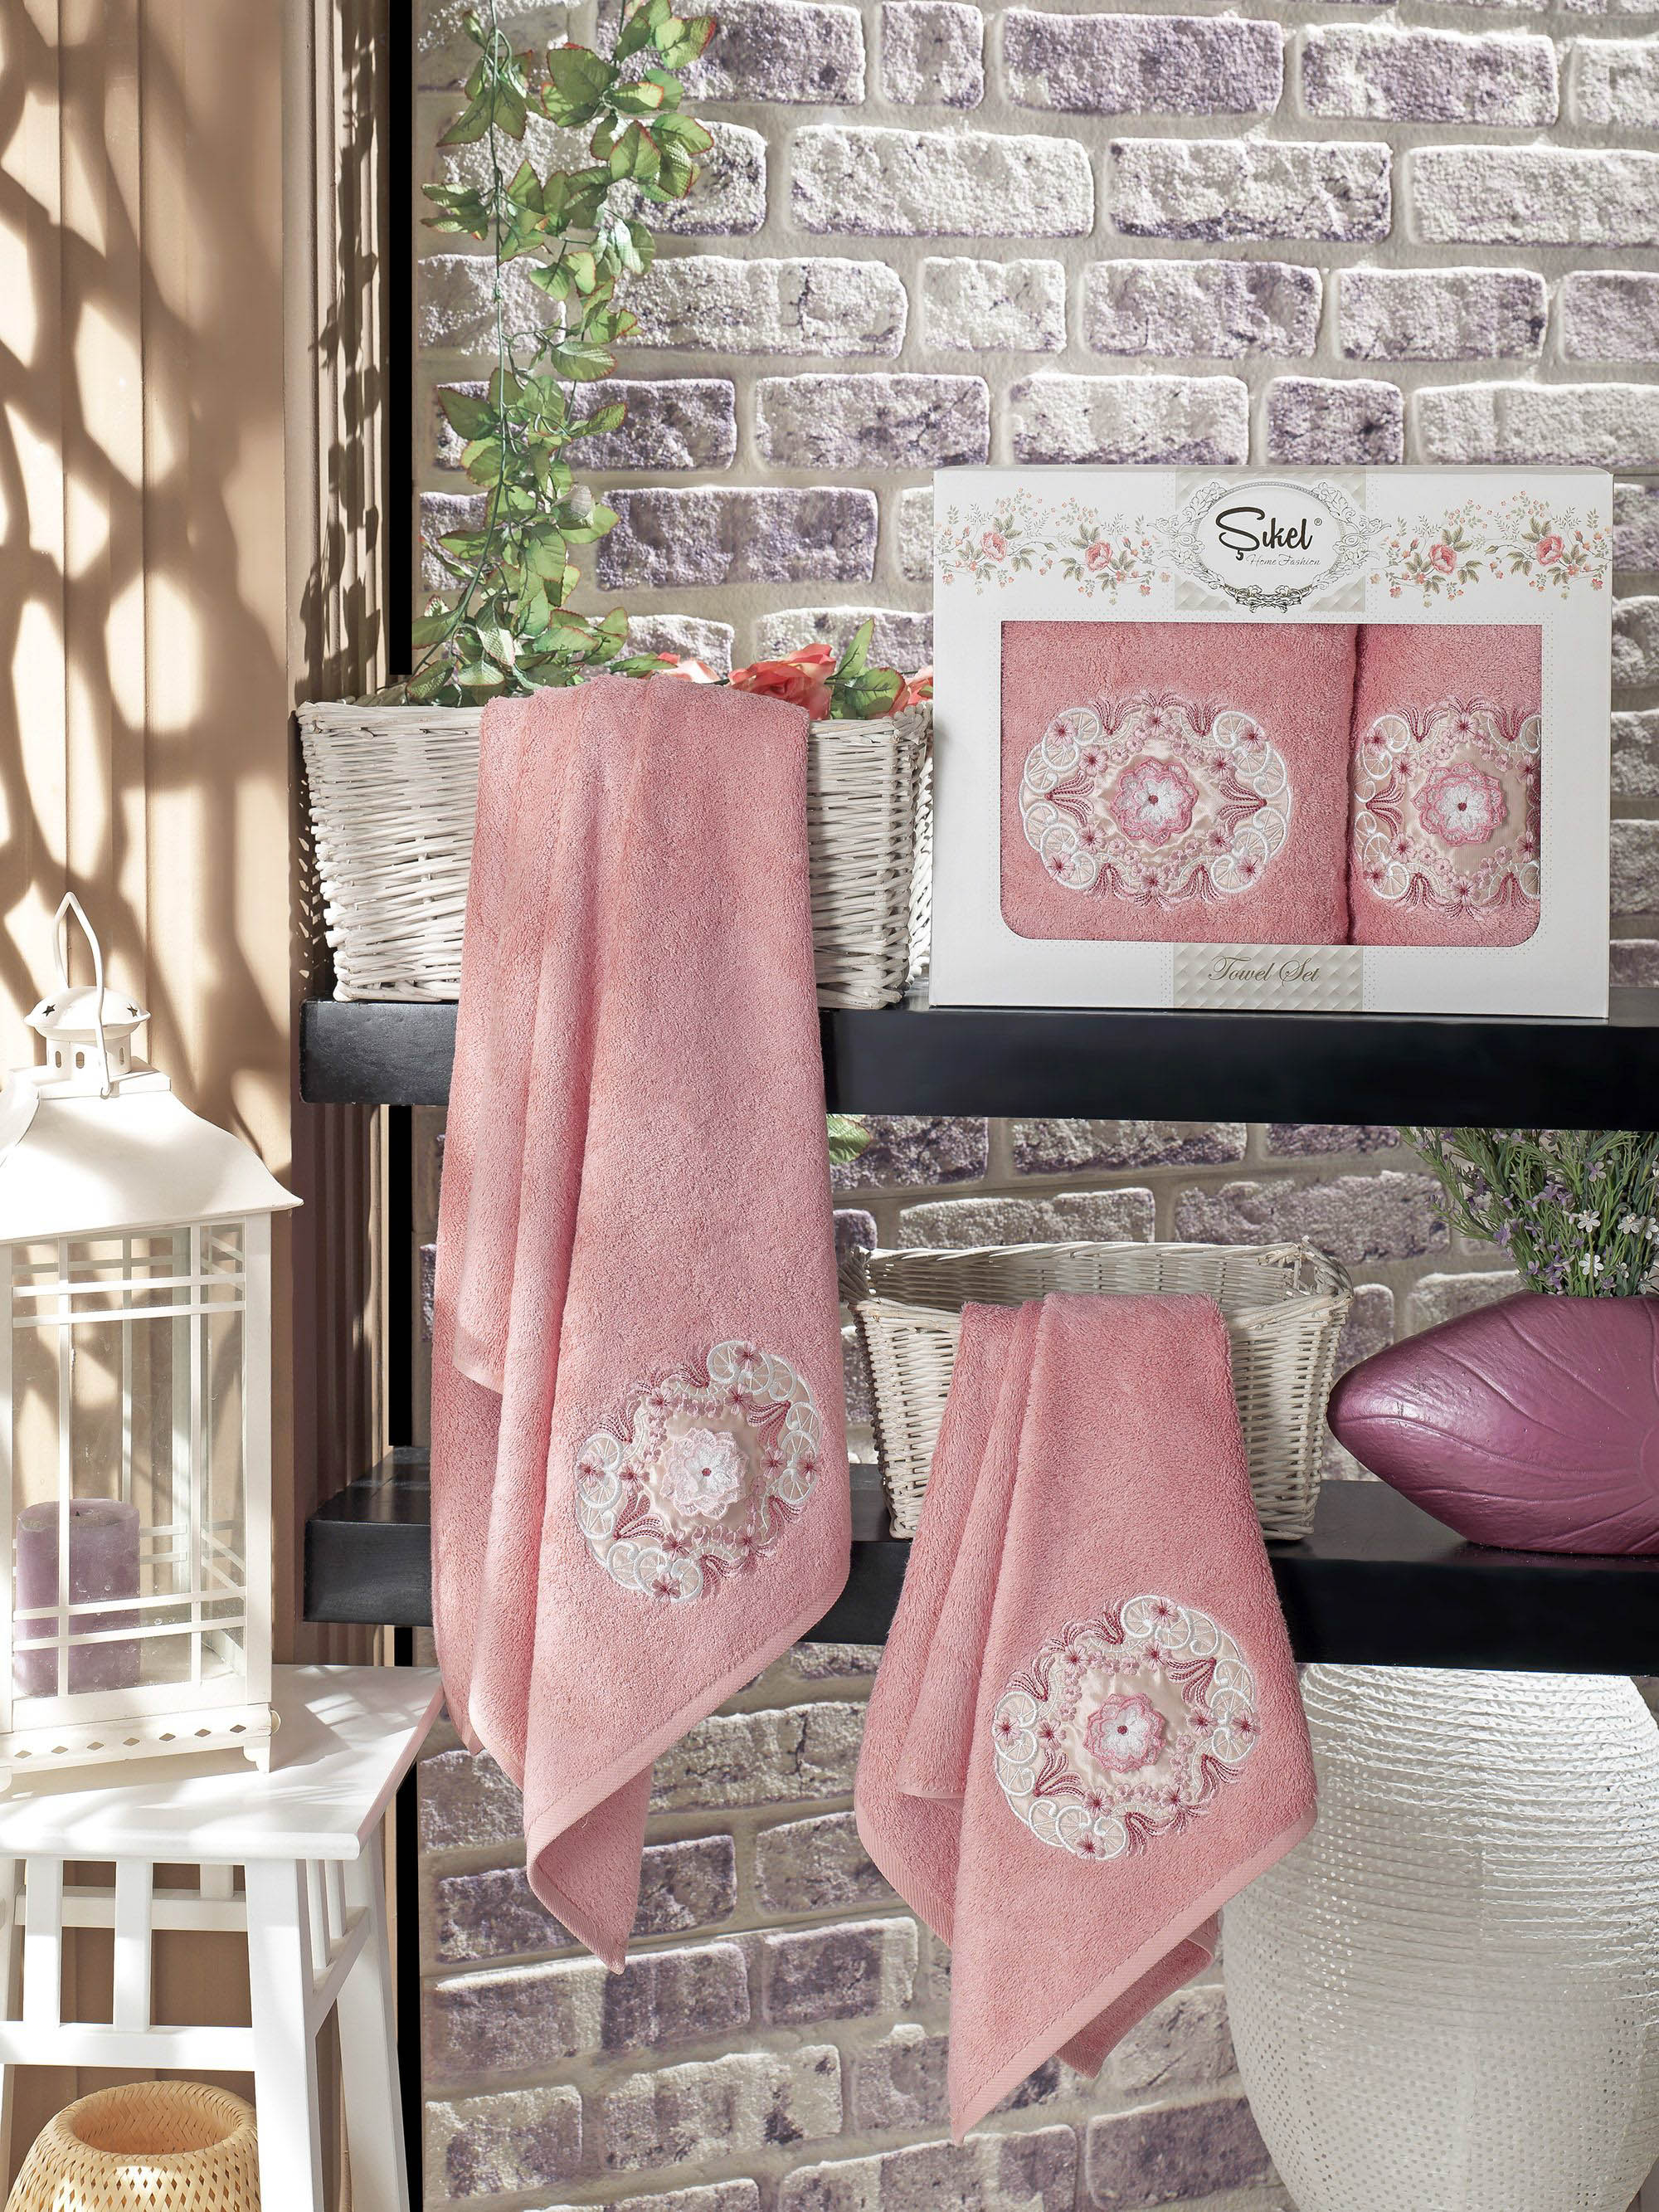 Полотенца Sikel Набор из 2 полотенец Kamelya Цвет: Пудра набор из 2 полотенец merzuka sakura 50х90 70х140 8430 кремовый